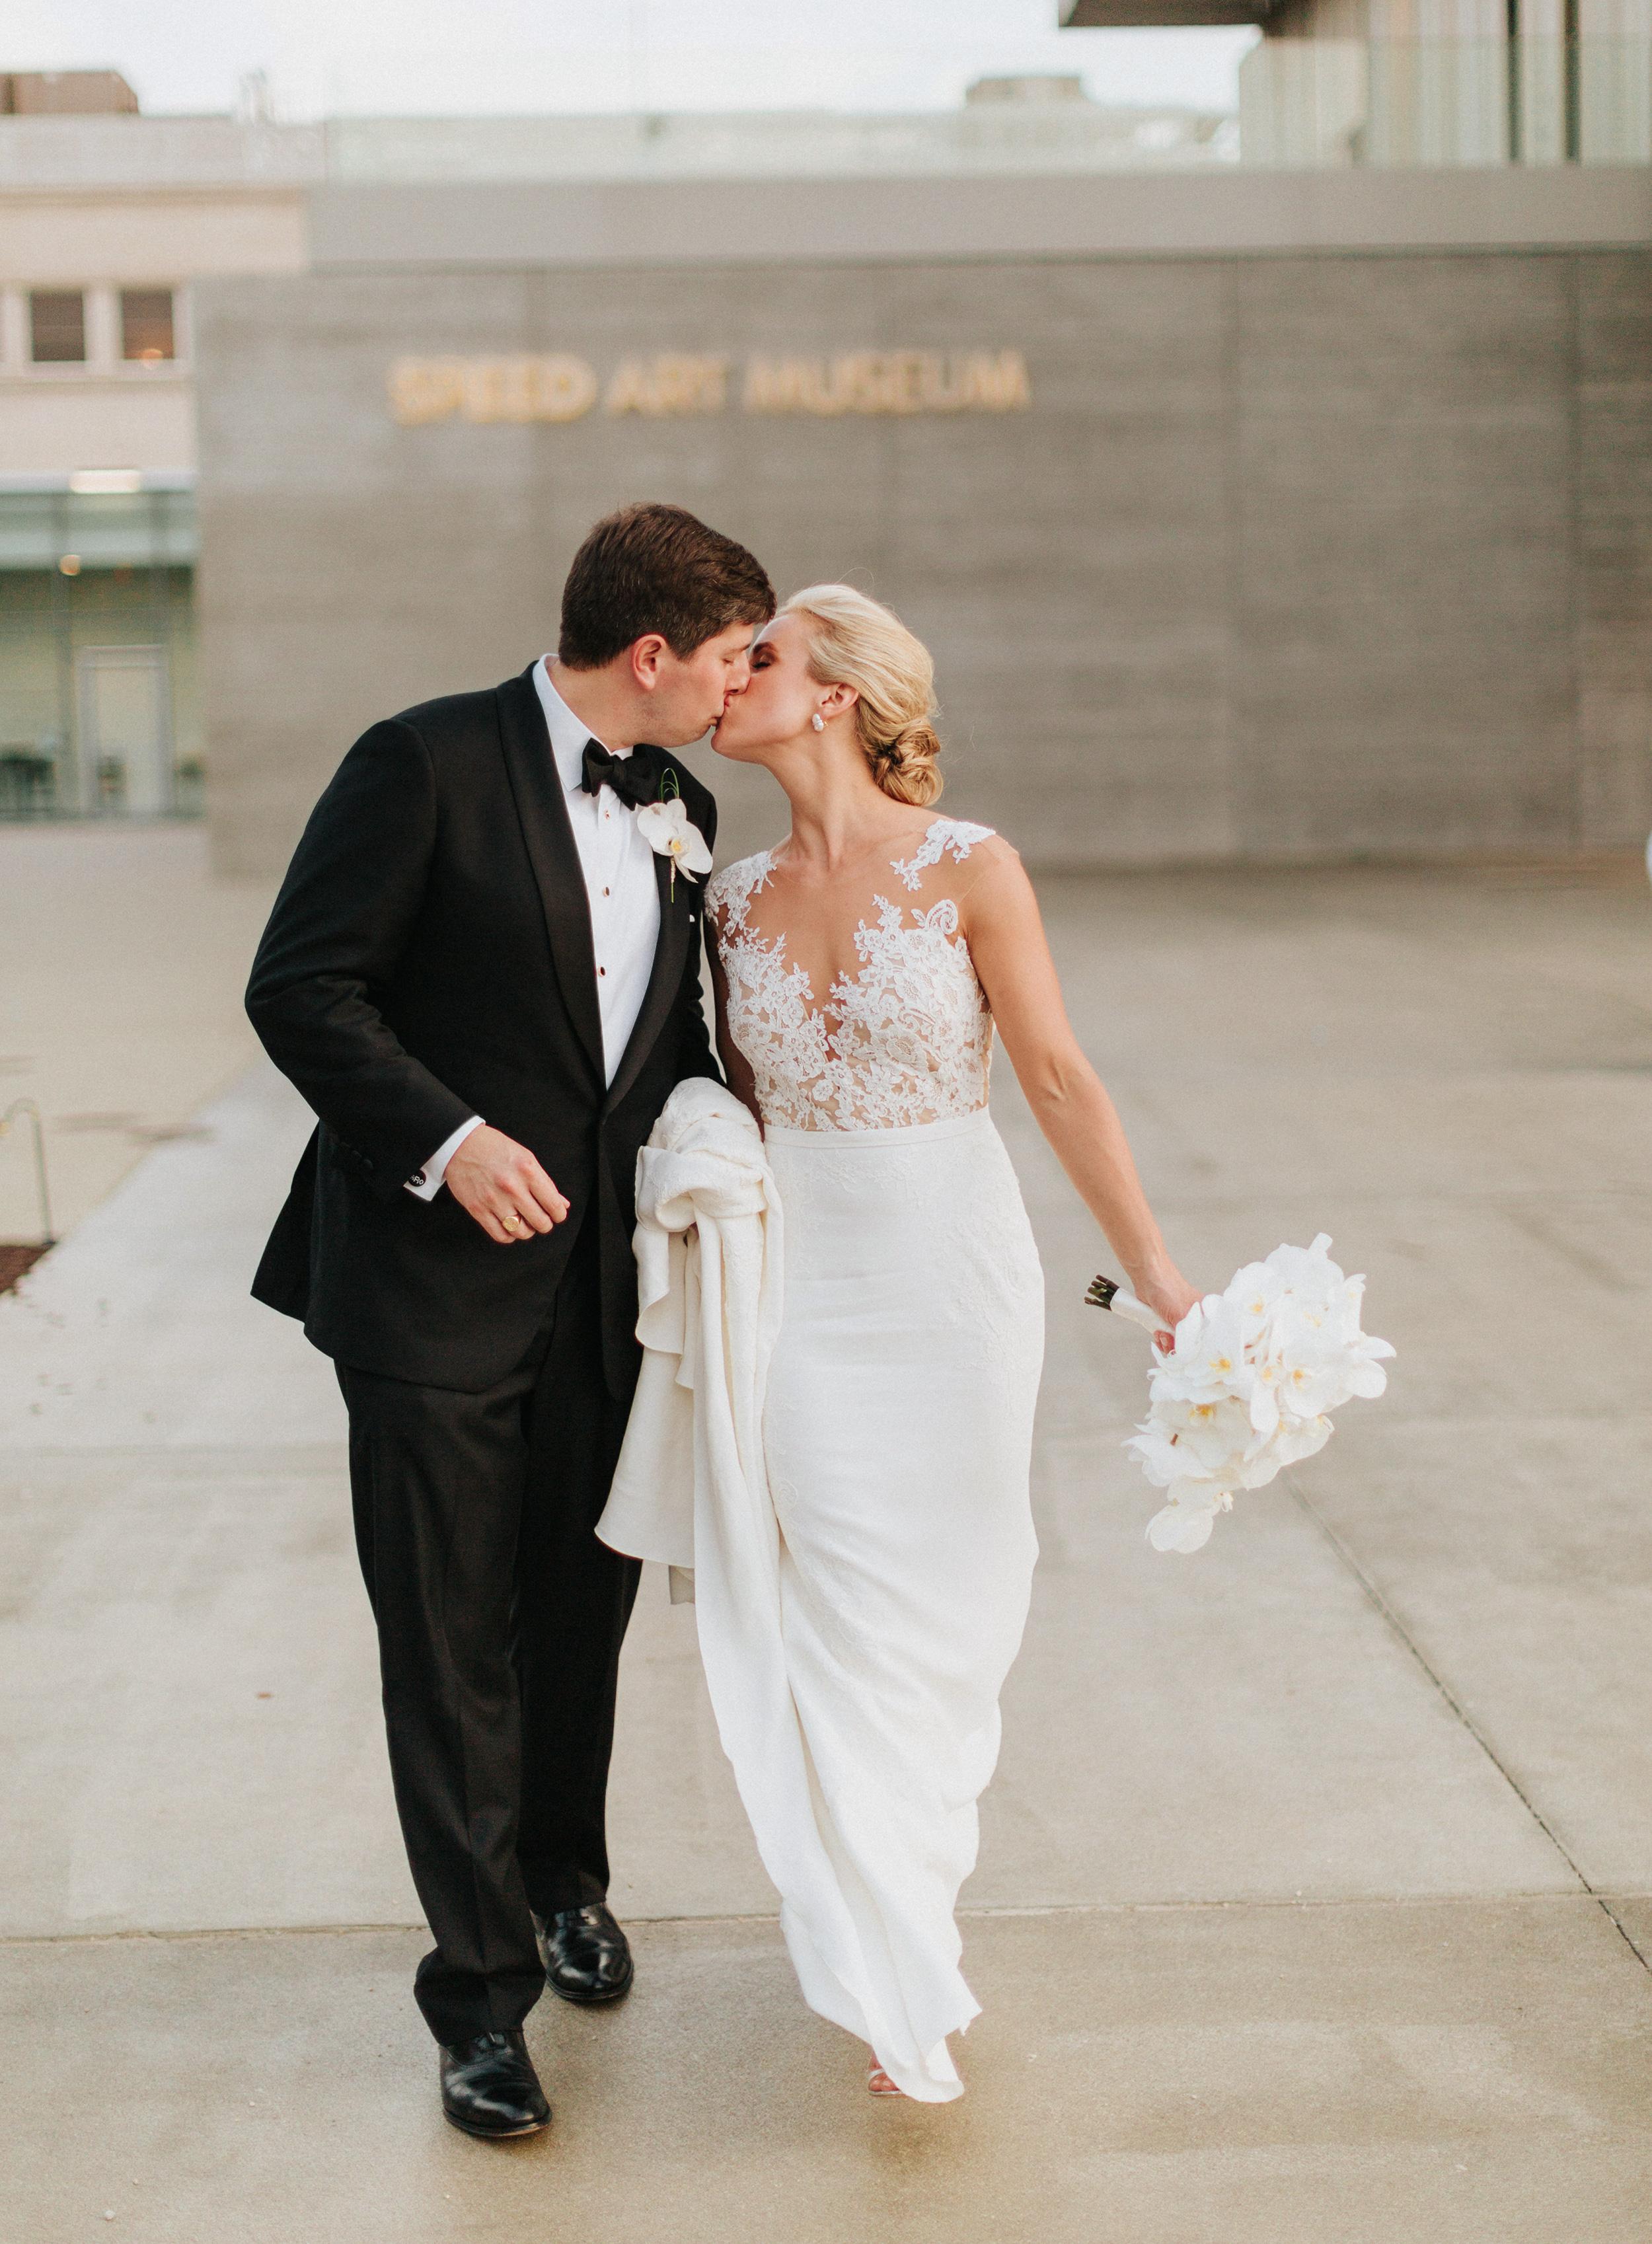 speed-art-museum-wedding-photographer-22.JPG